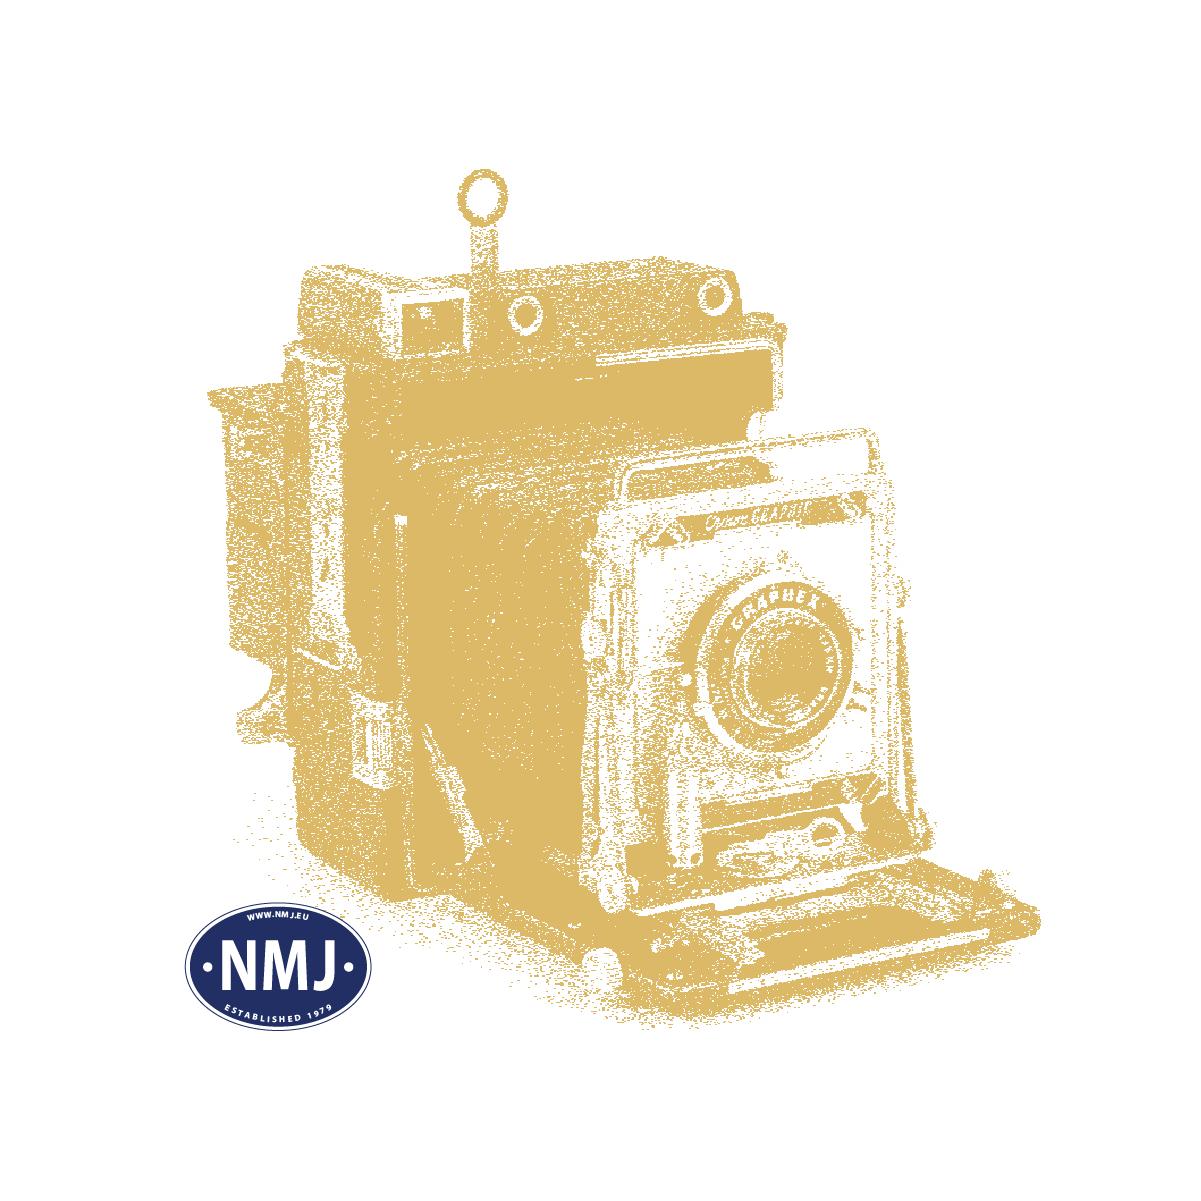 NOC36904 - Motorsyklister, N-Skala